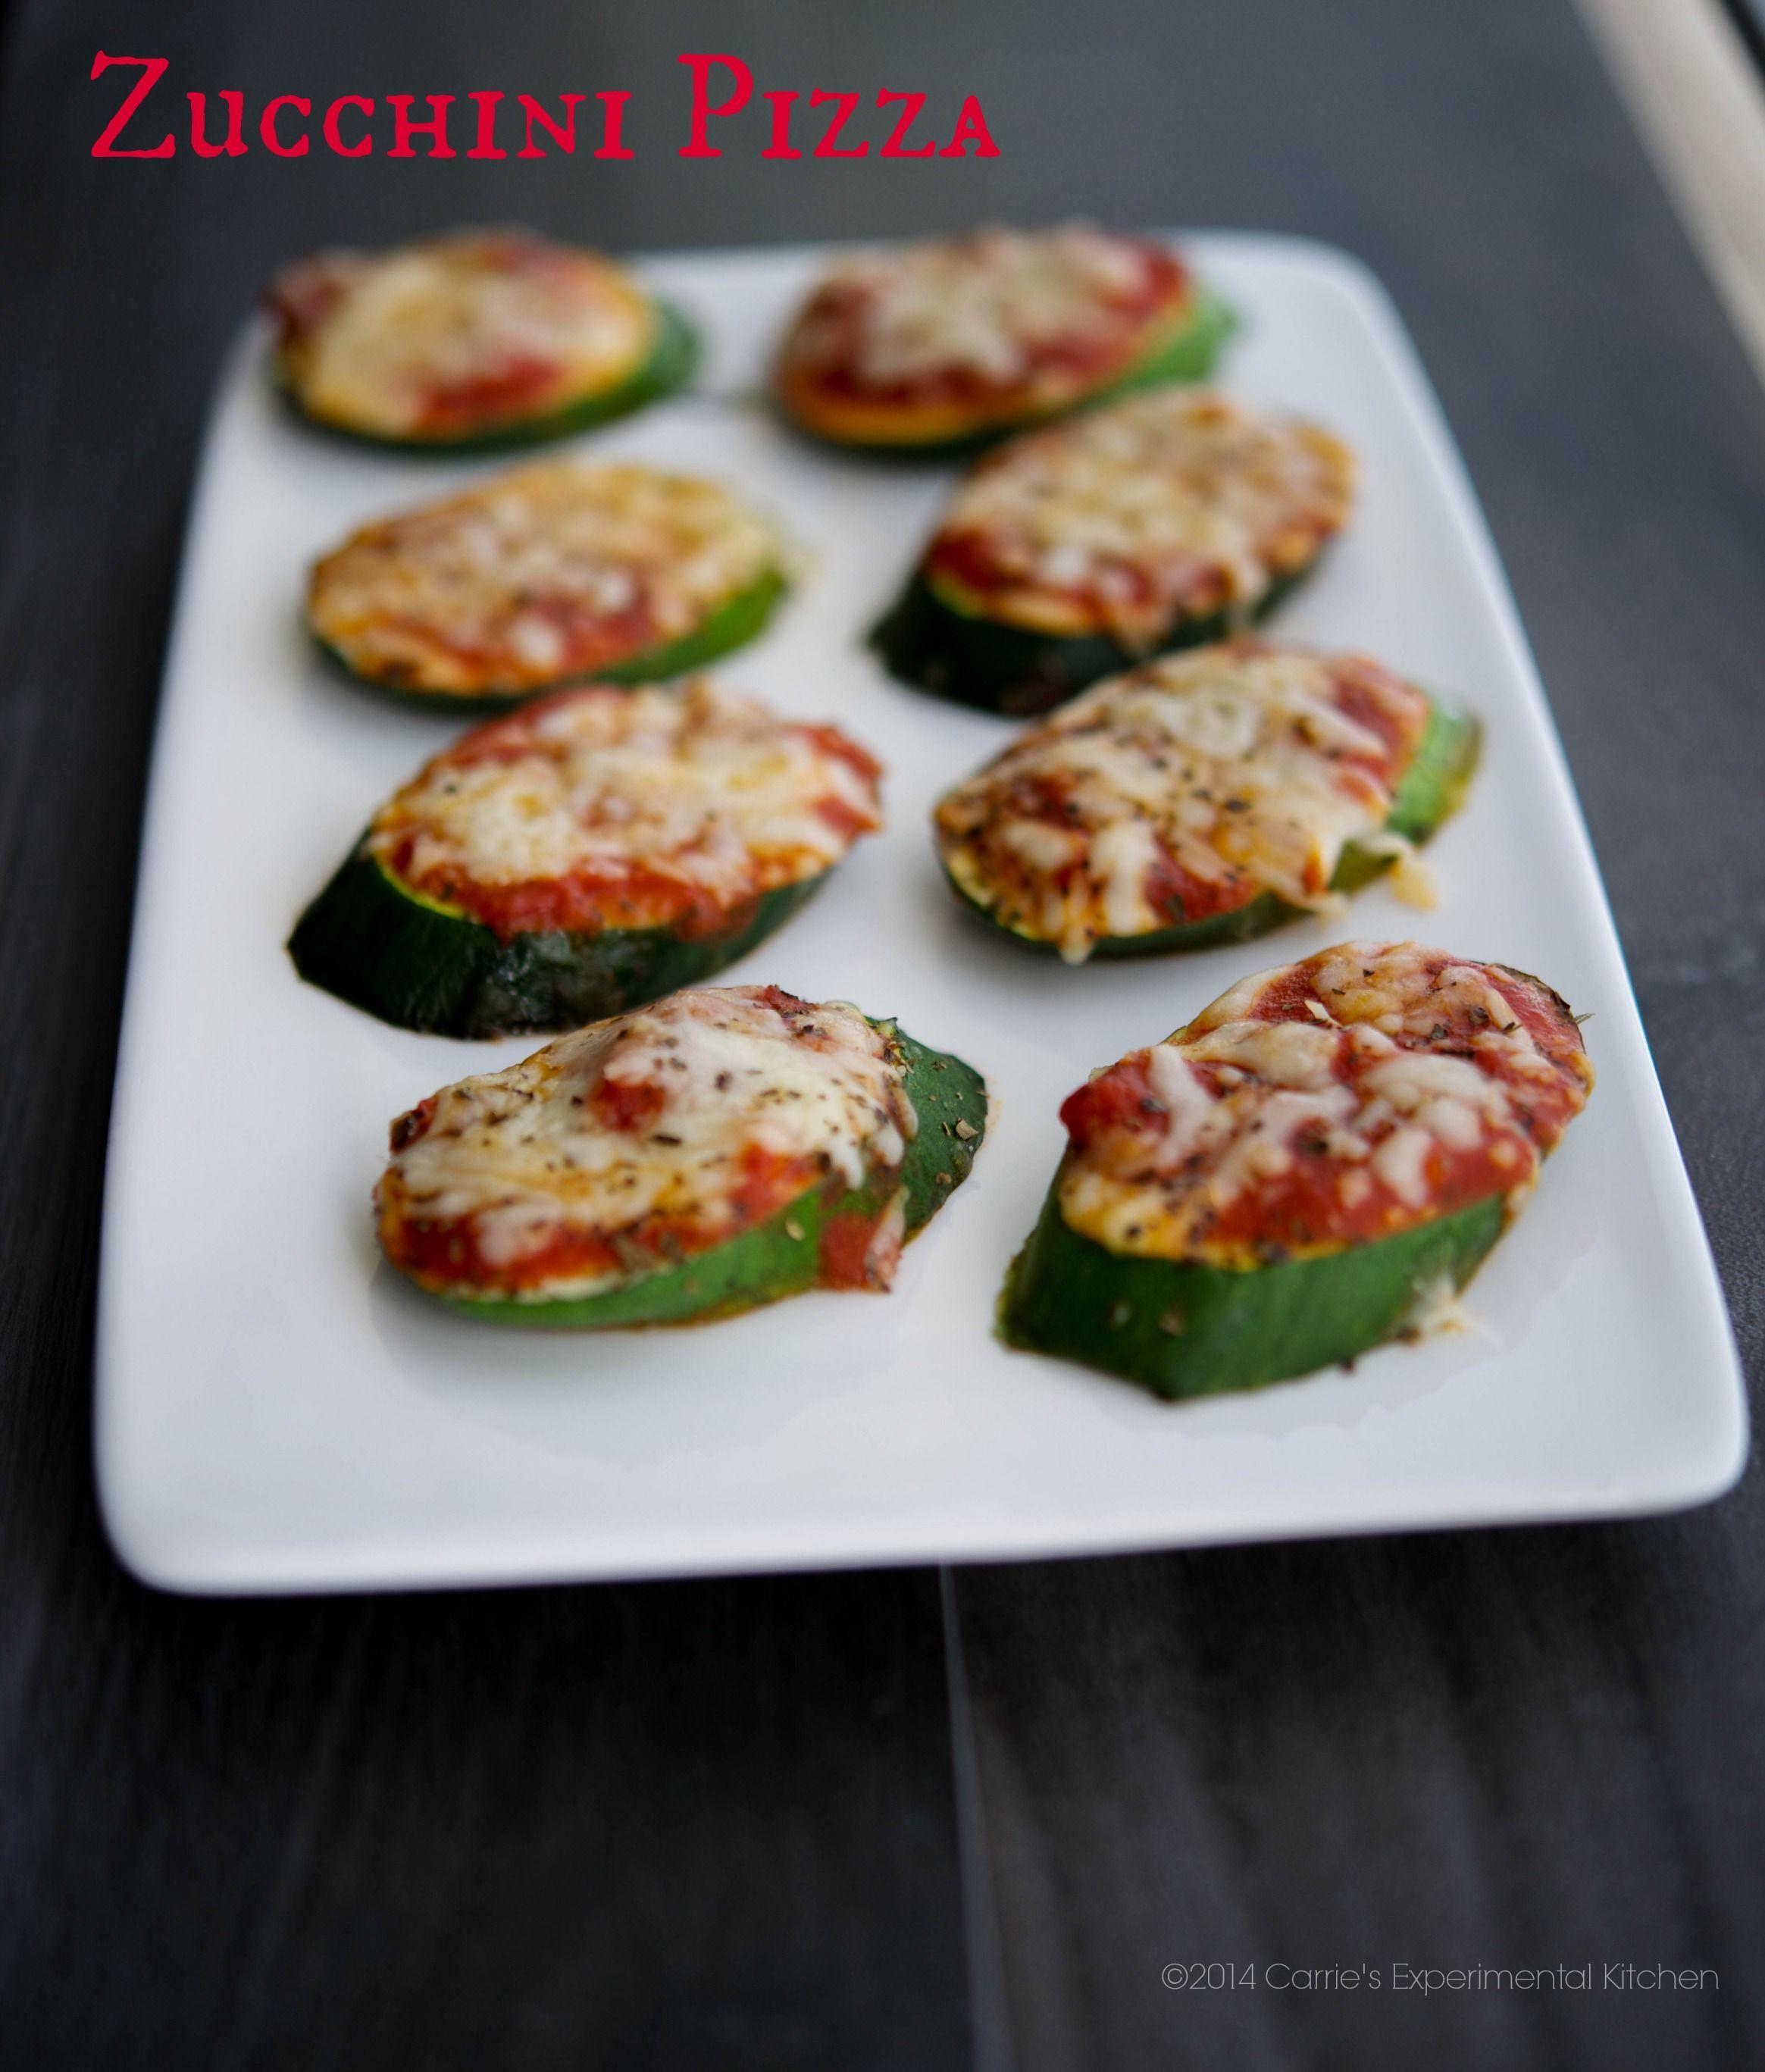 Zucchini Pizzas | Carrie's Experimental Kitchen #zucchini #gameday